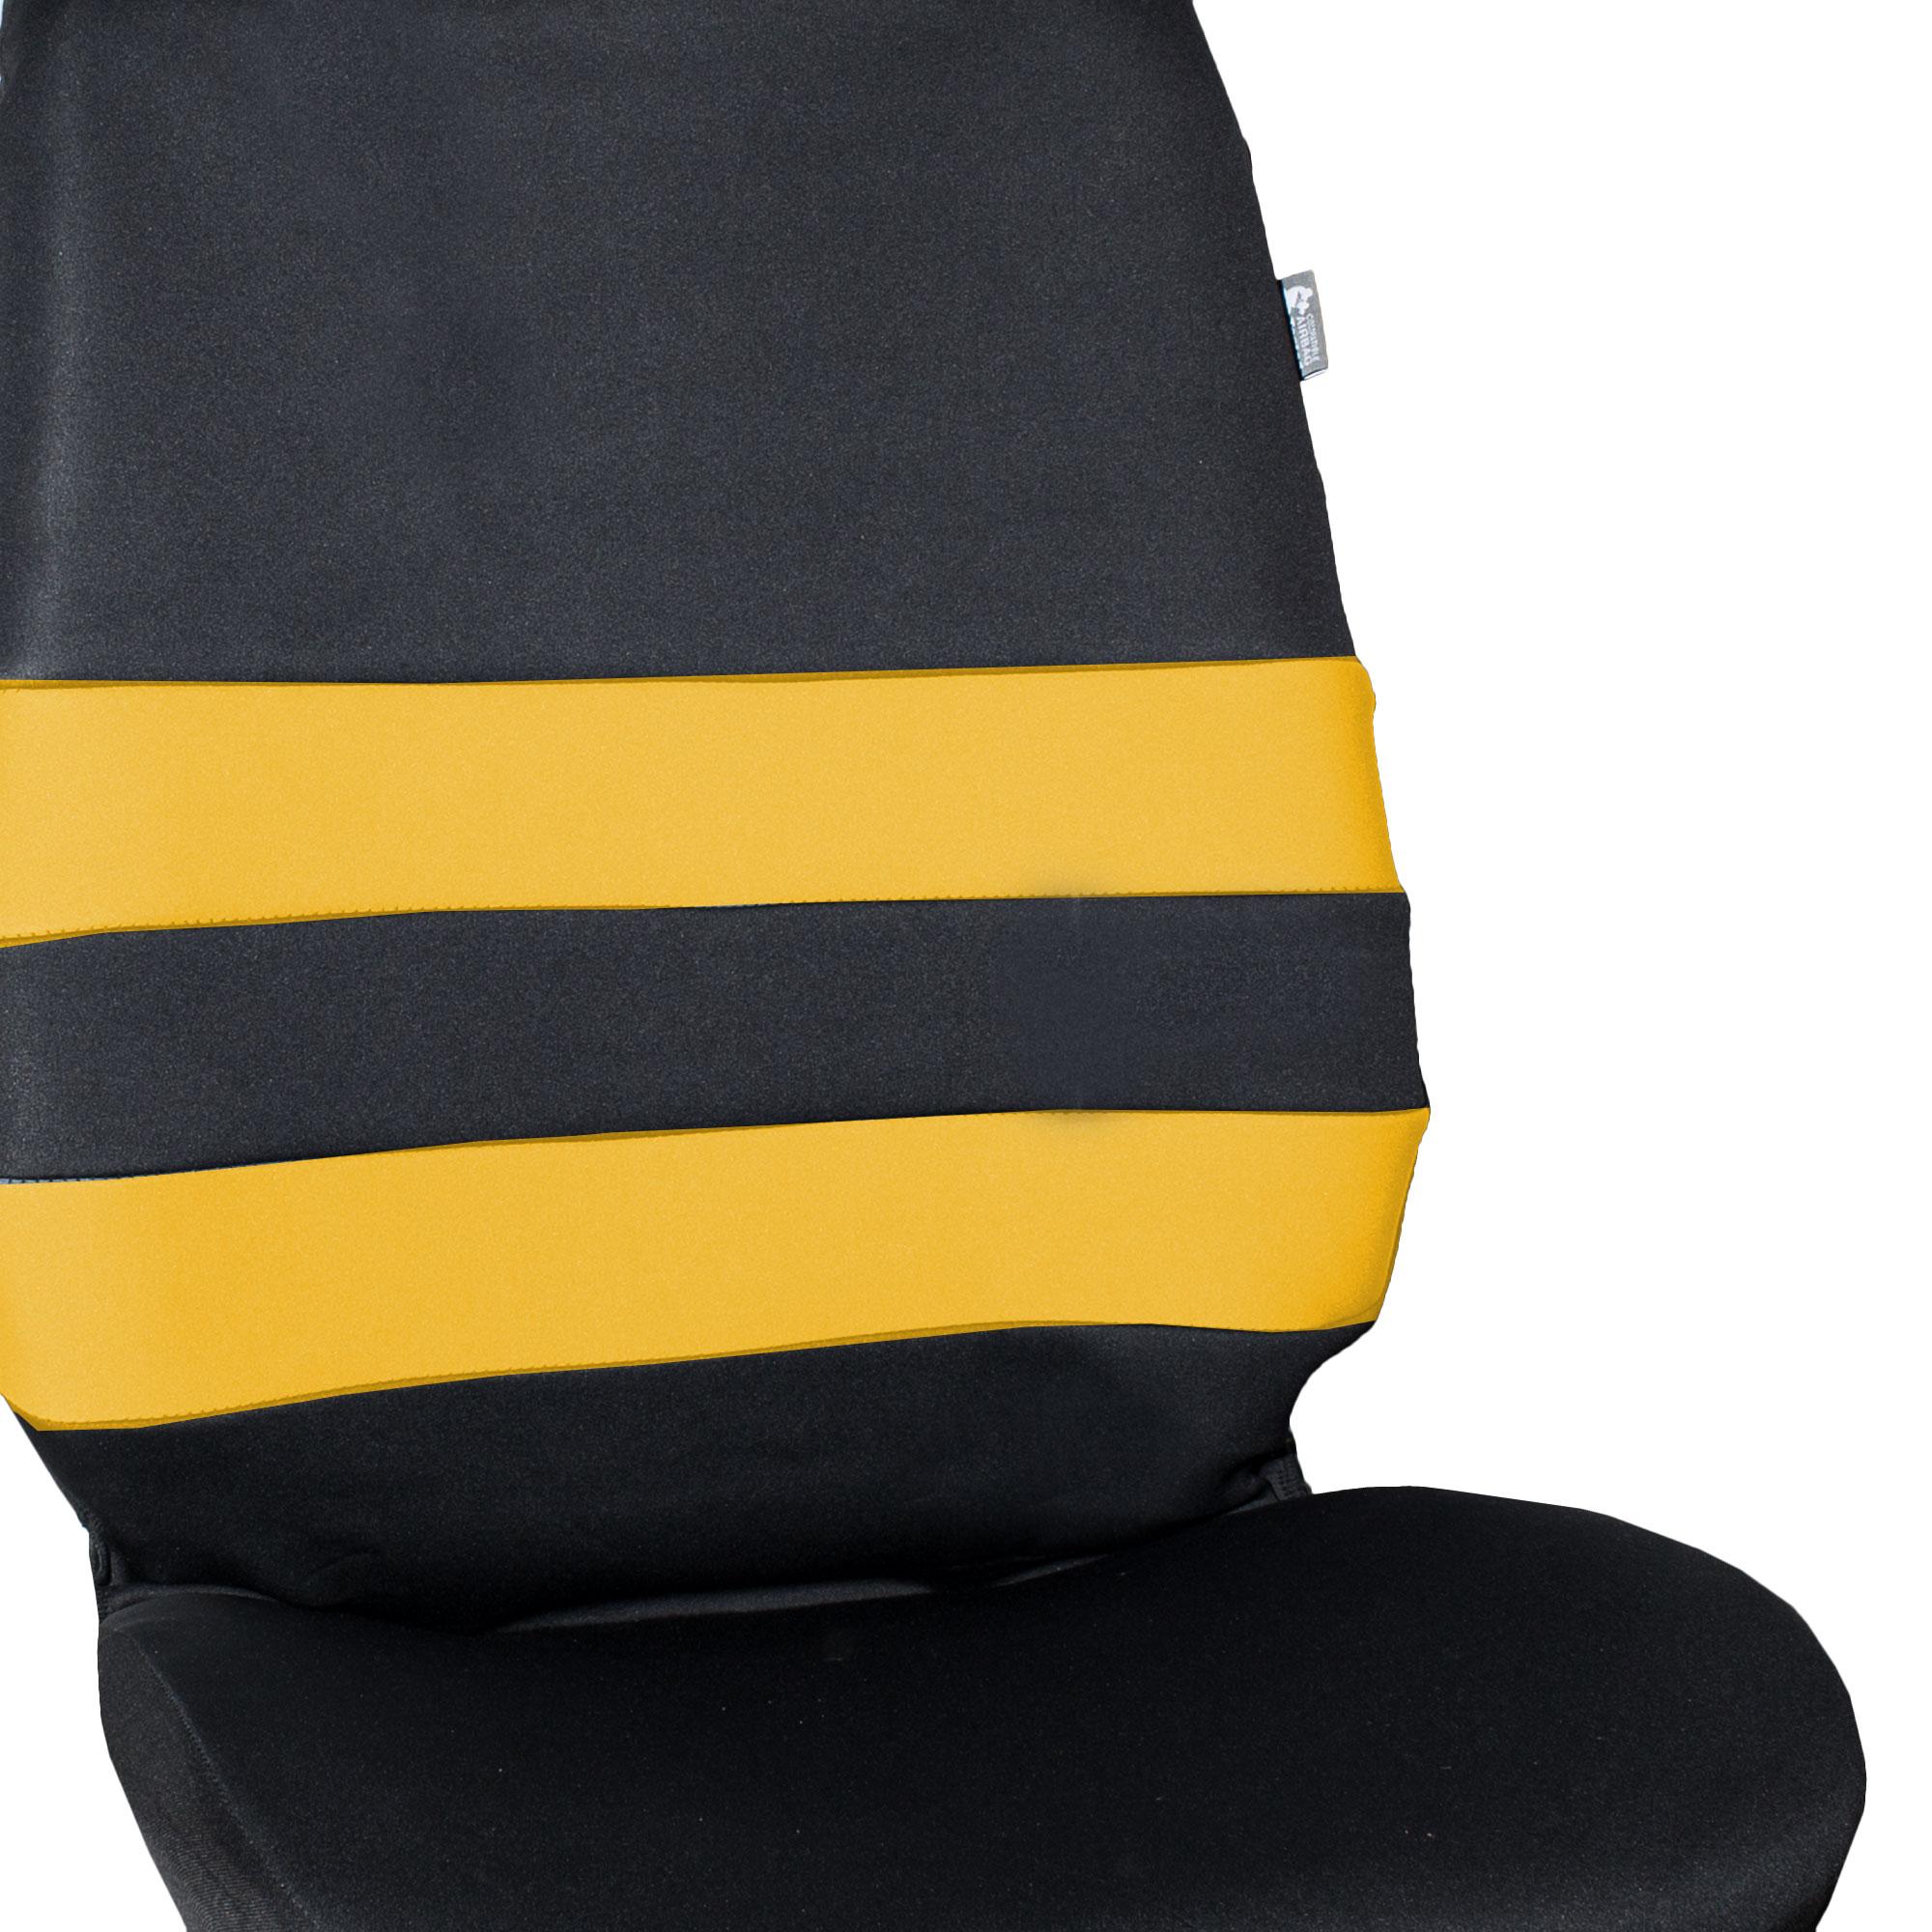 Neoprene Seat Covers Front Buckets For SUV Van Sedan Coupe